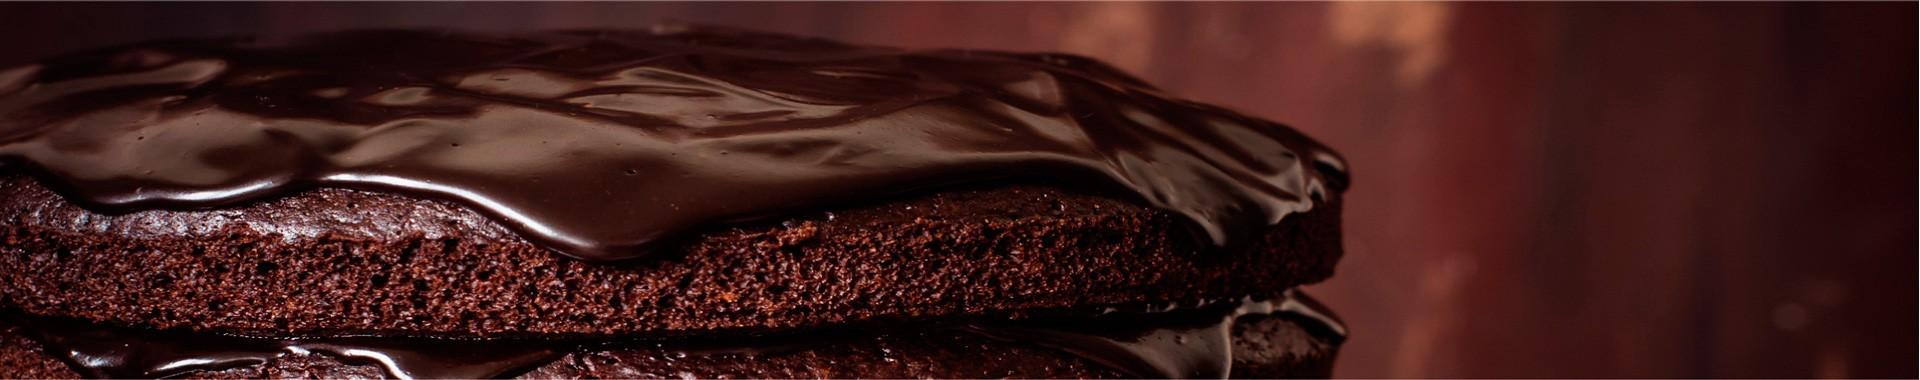 Mousse de mascarpone con chocolate